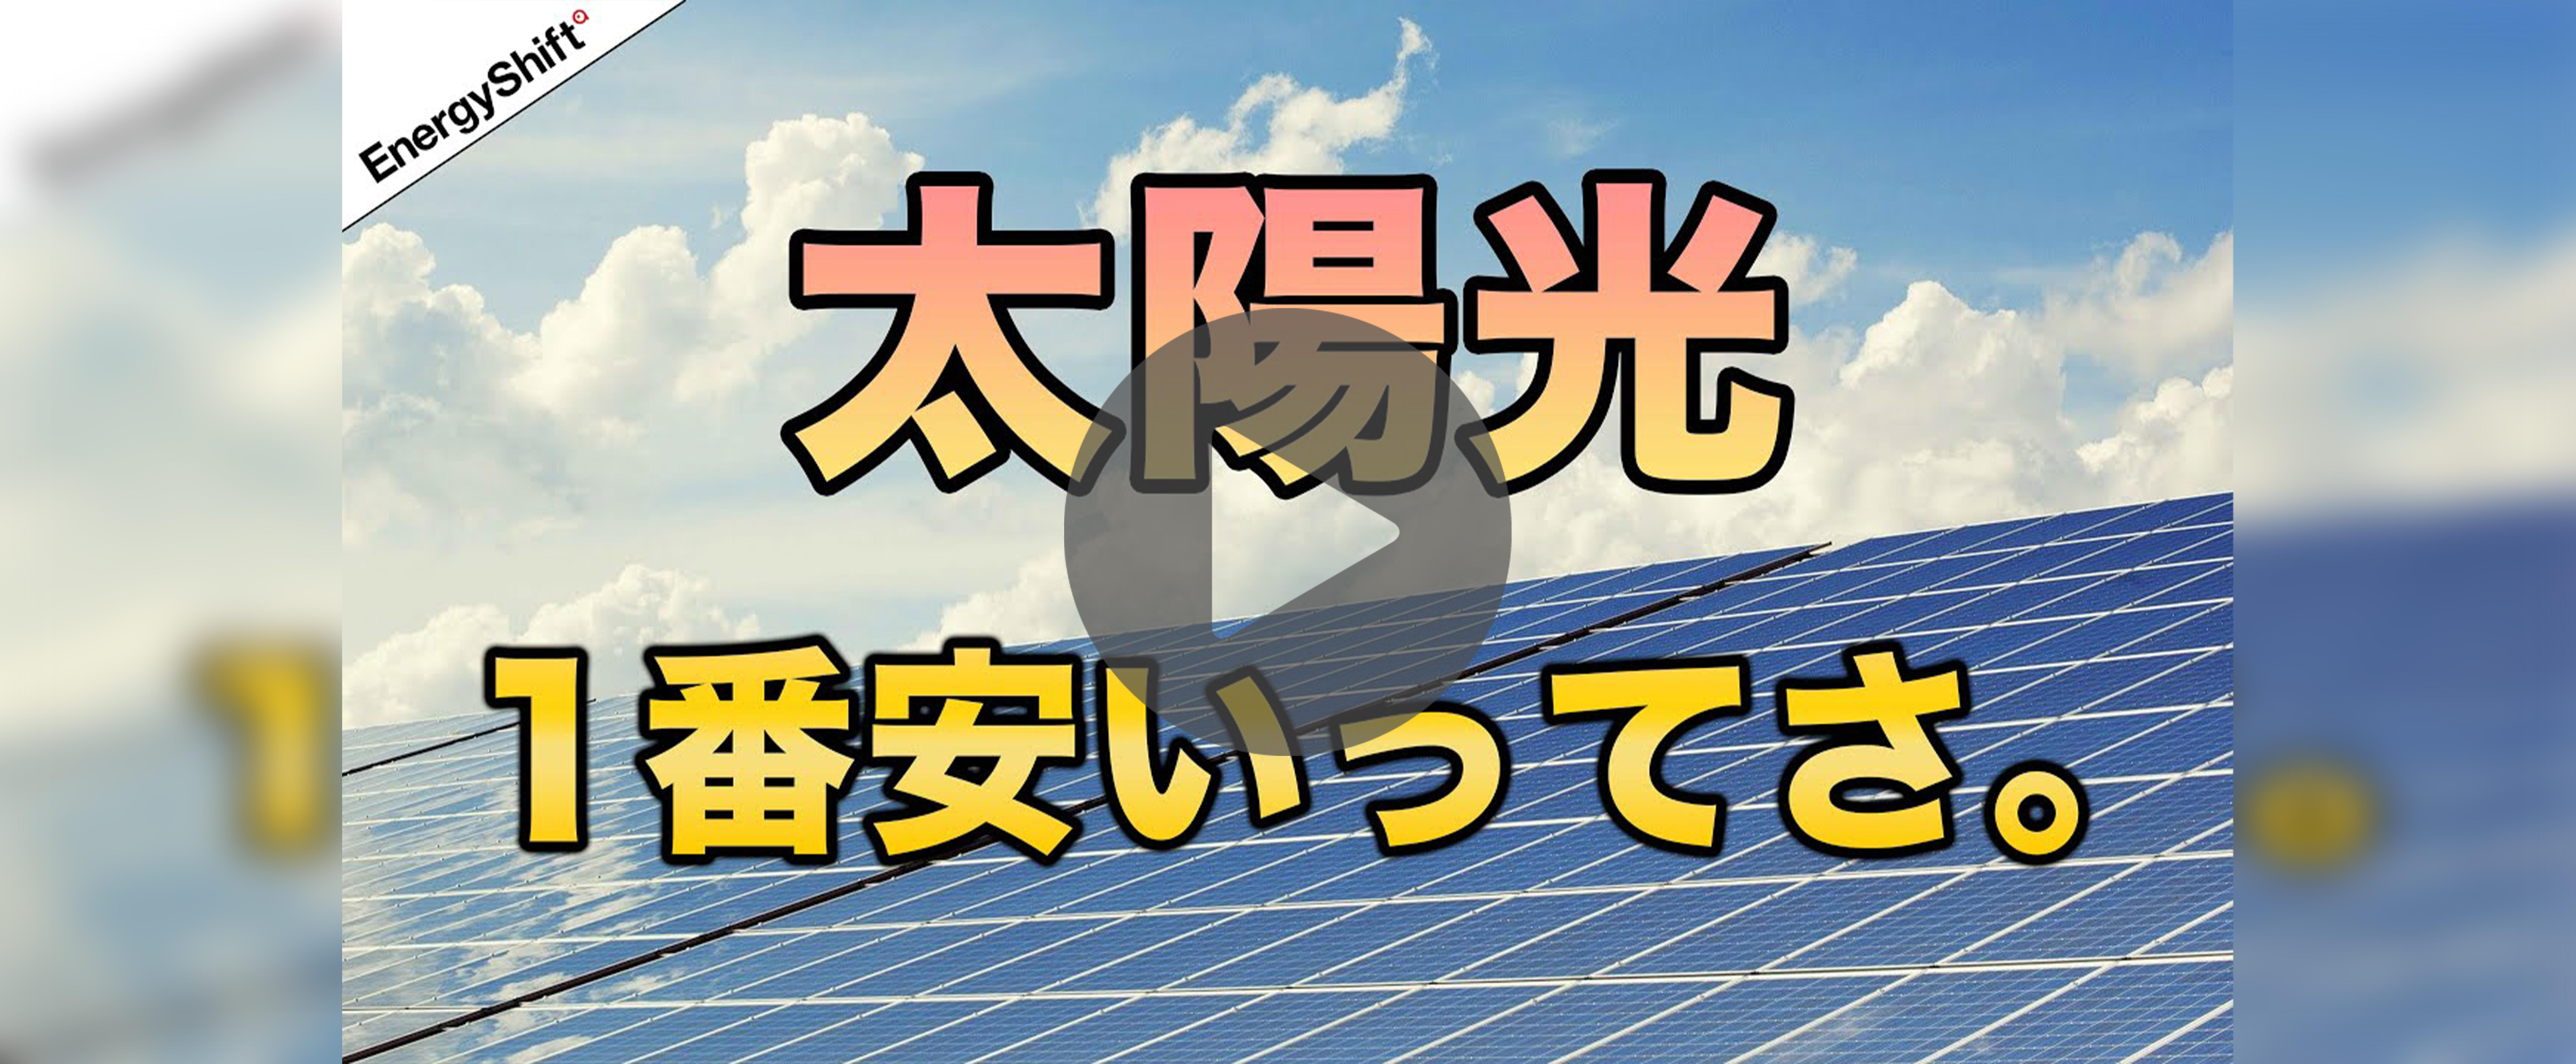 【YouTube】太陽光発電、30年時点で原発より安く 経産省試算